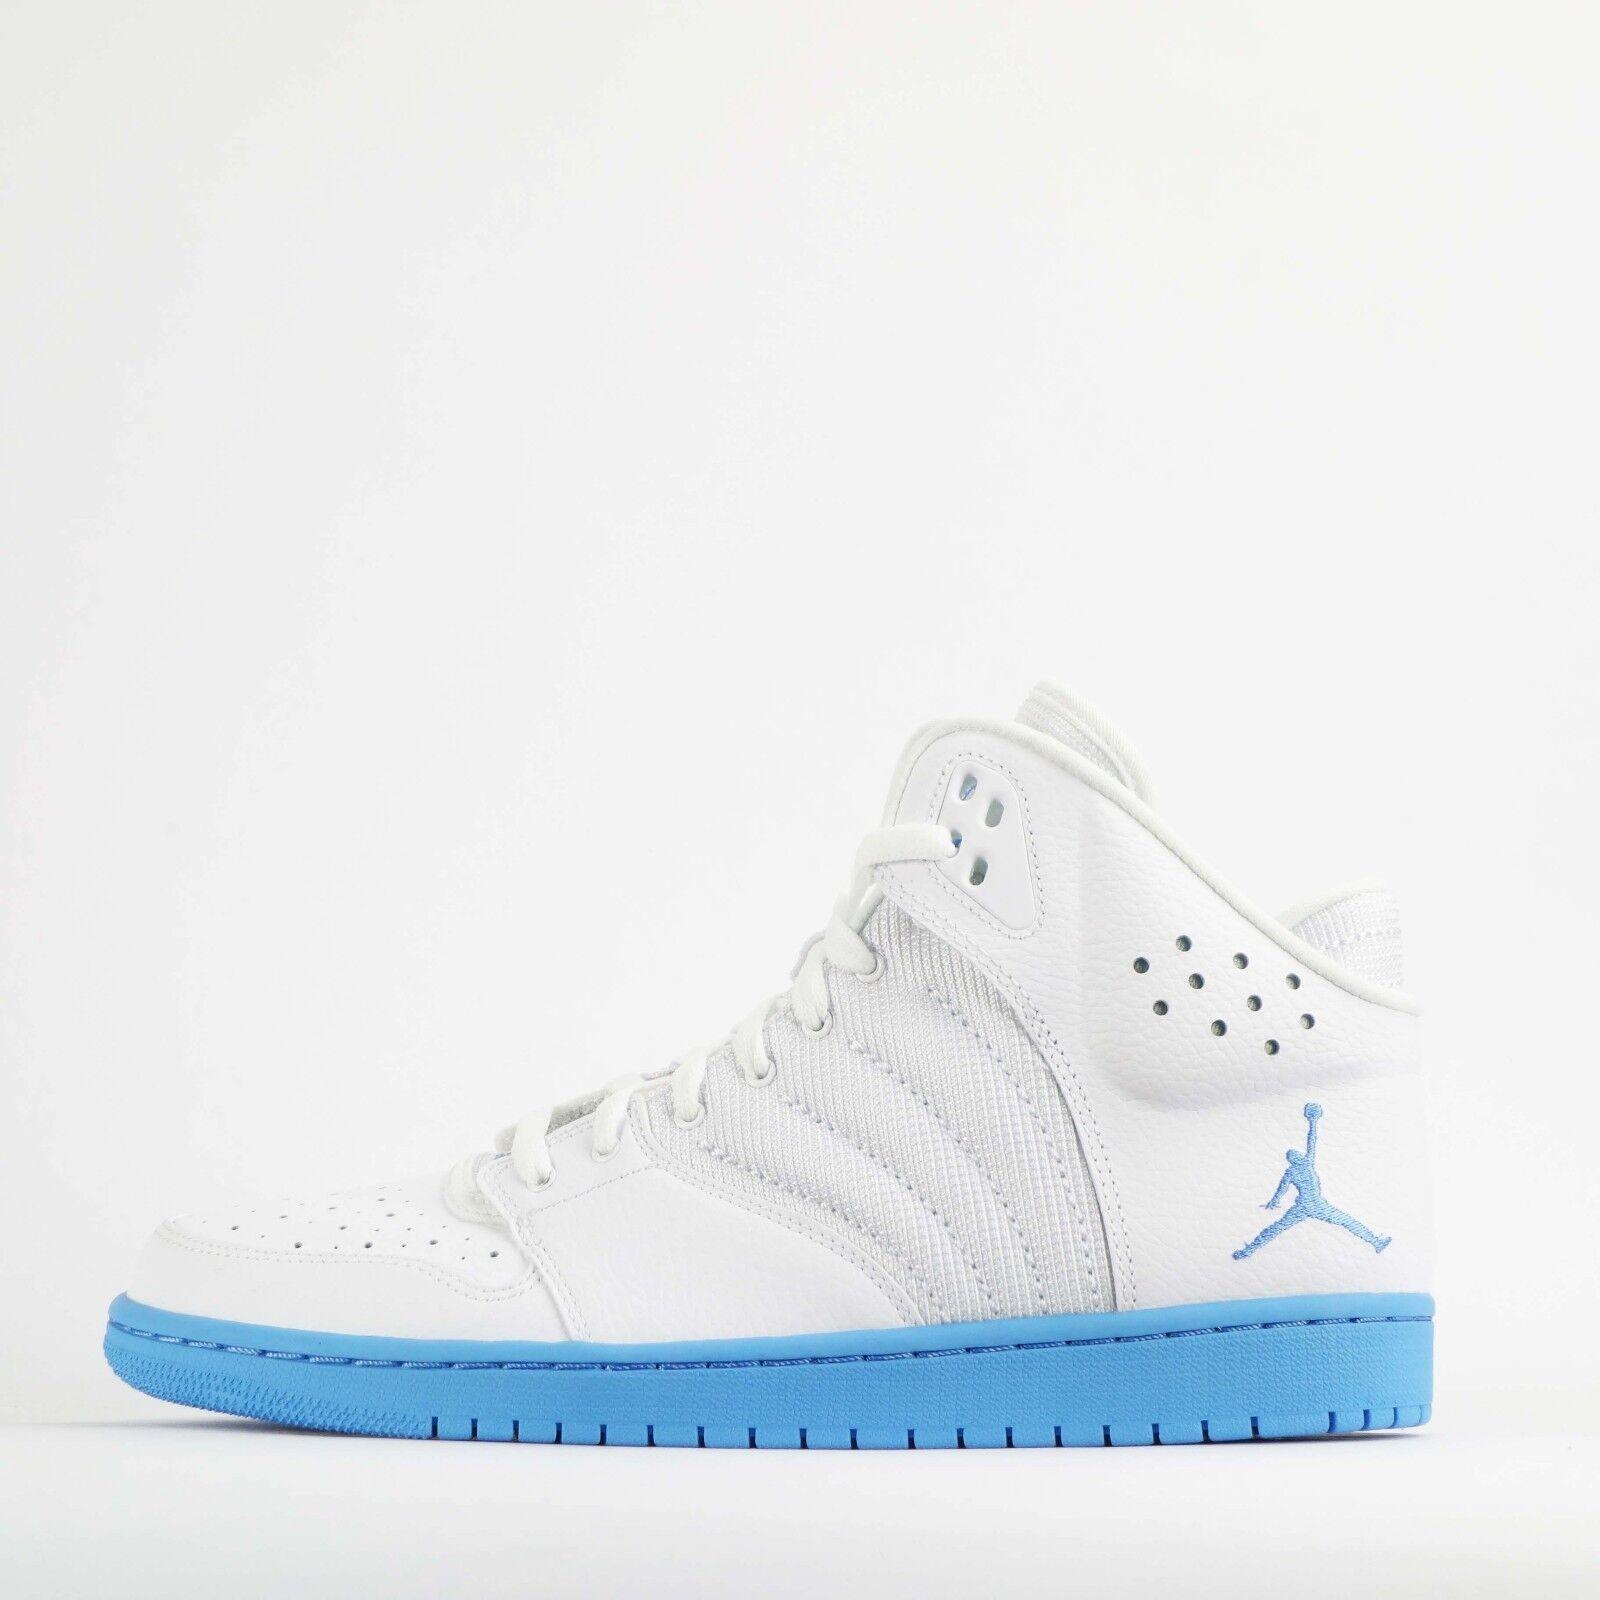 Nike Jordan 1 Flight 4 hommes Trainers blanc/University Chaussures blanc/University Trainers bleu 91bc6c